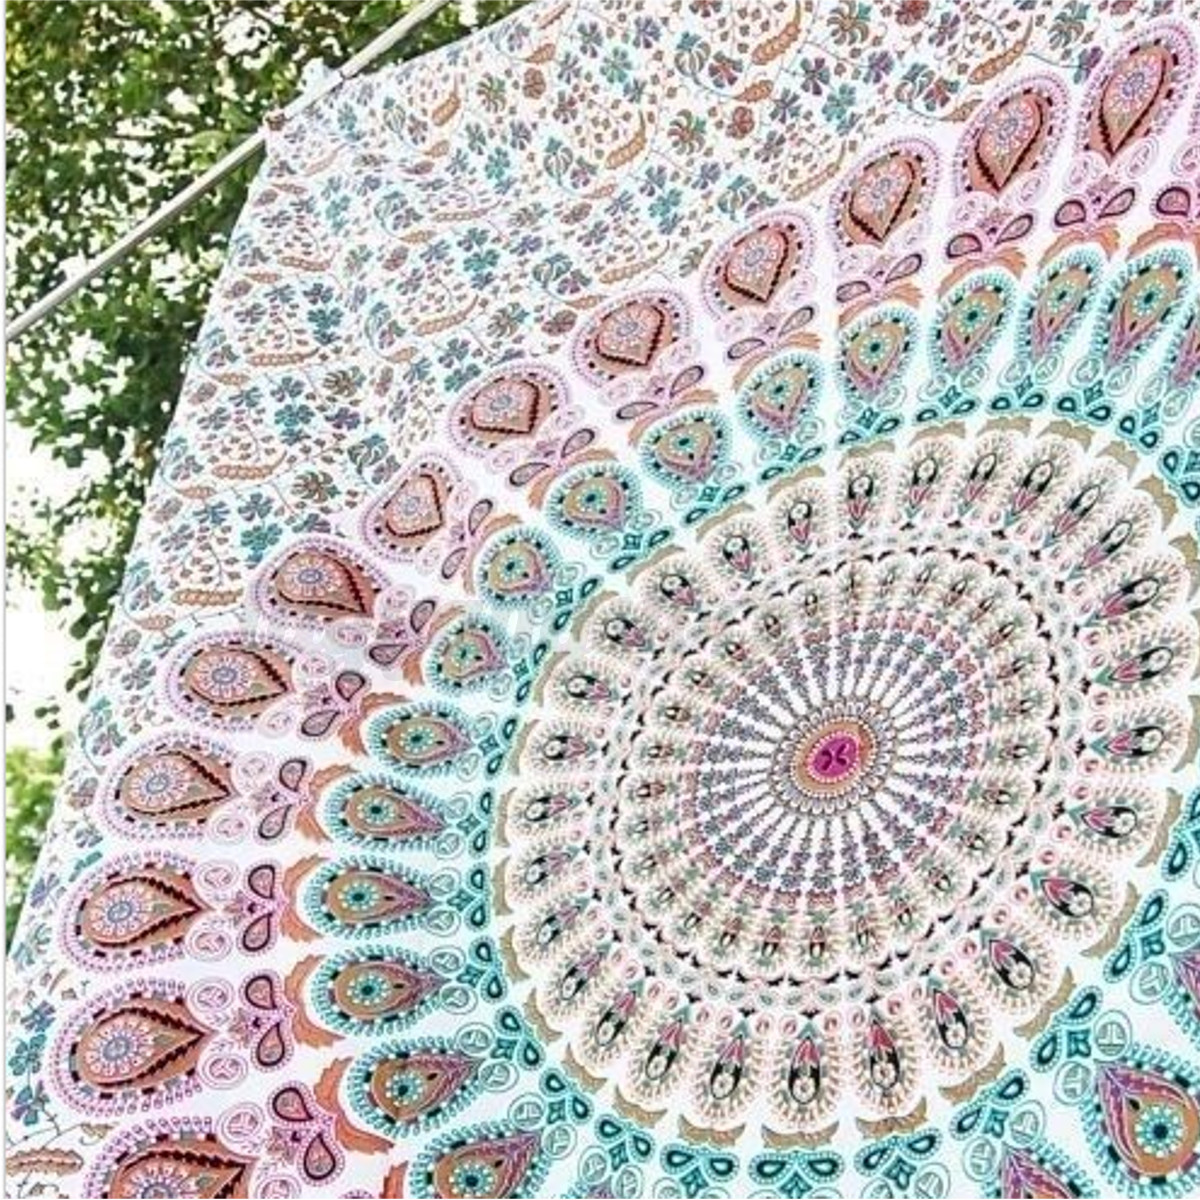 indisch mandala tapisserie wandteppich wandbehang badetuch. Black Bedroom Furniture Sets. Home Design Ideas